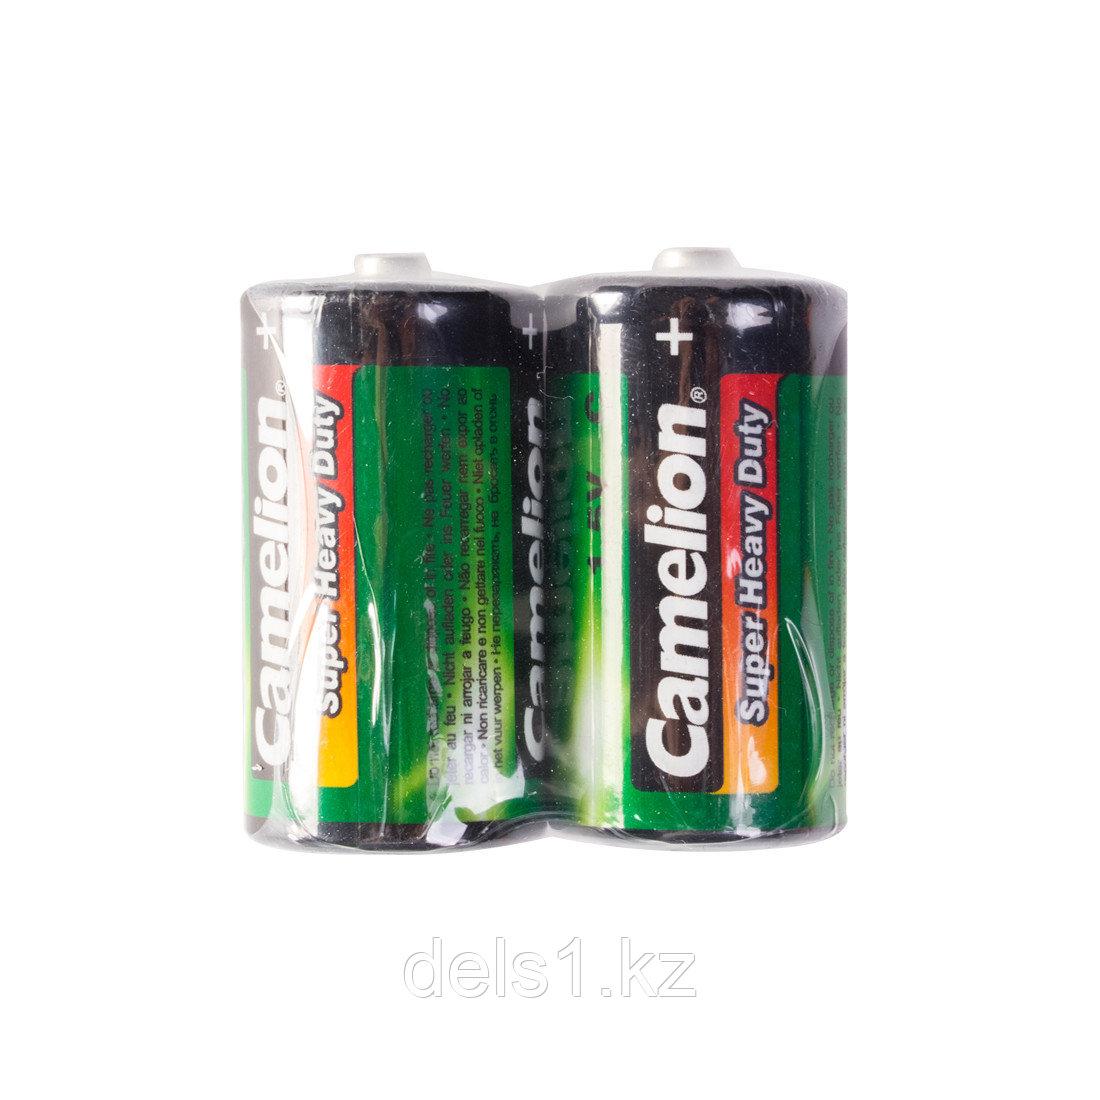 Батарейка, CAMELION, R14P-SP2G, Super Heavy Duty, C, 1.5V, mAh, 2 шт., пленка